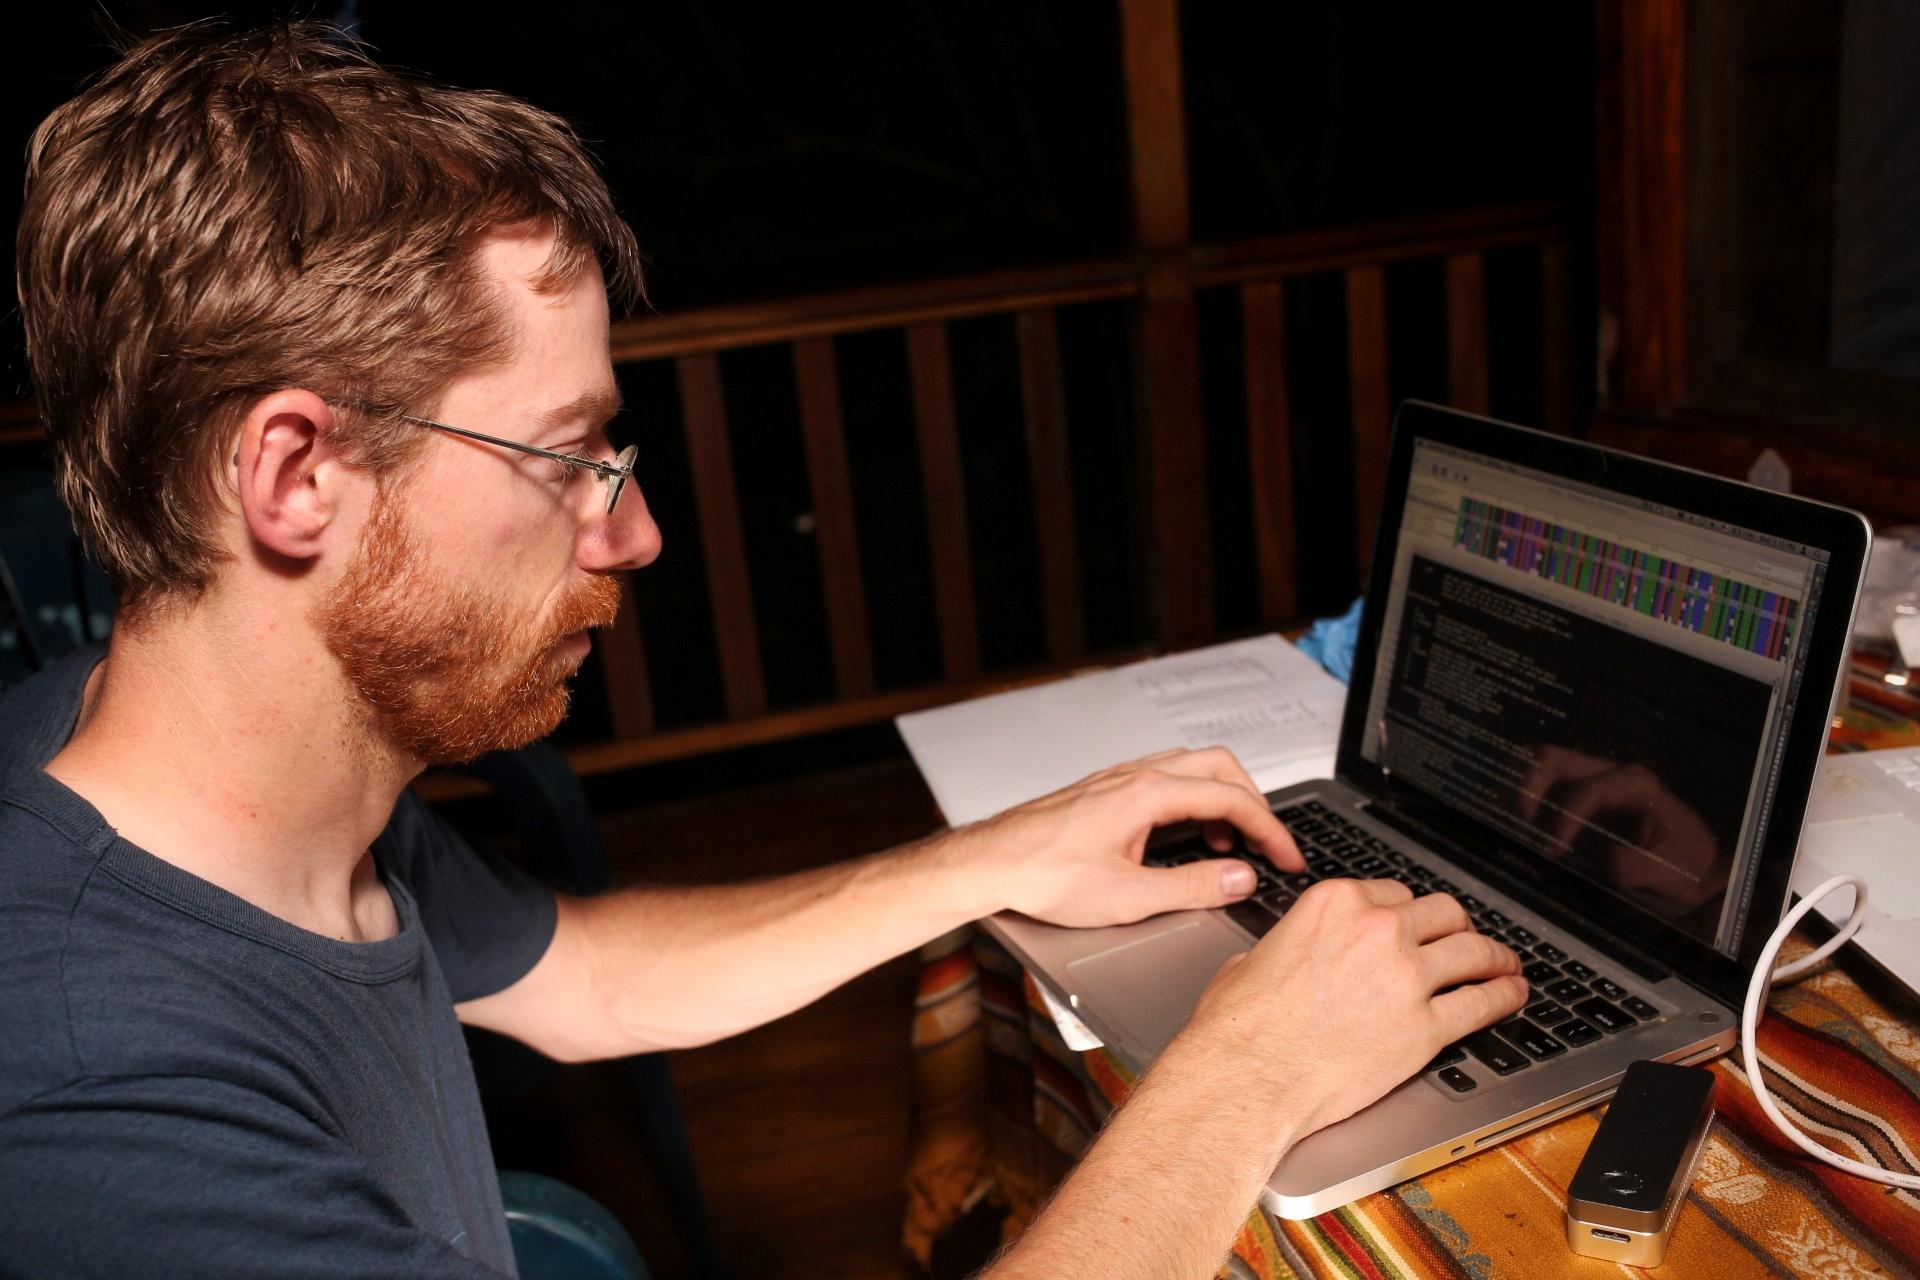 Stefan working on his nanopore bioinformatics in the jungle.